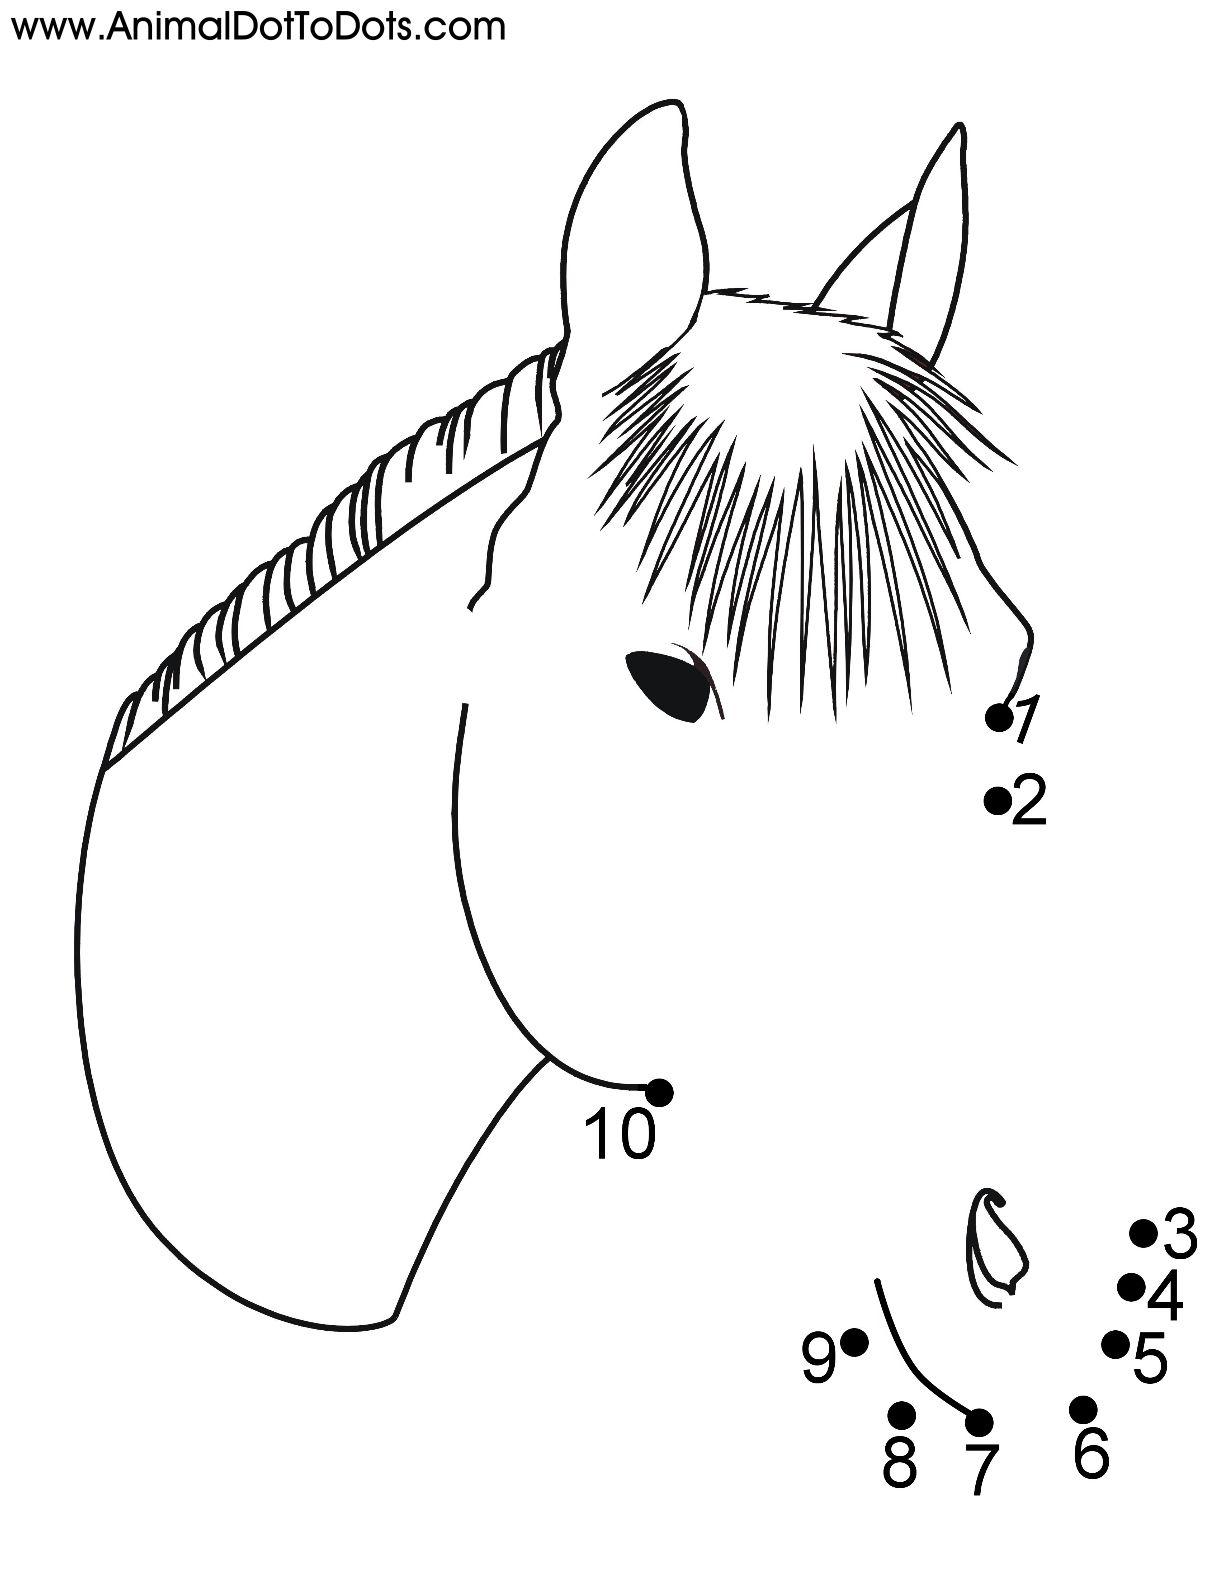 Free Printable Animal Dot To Dot Horse